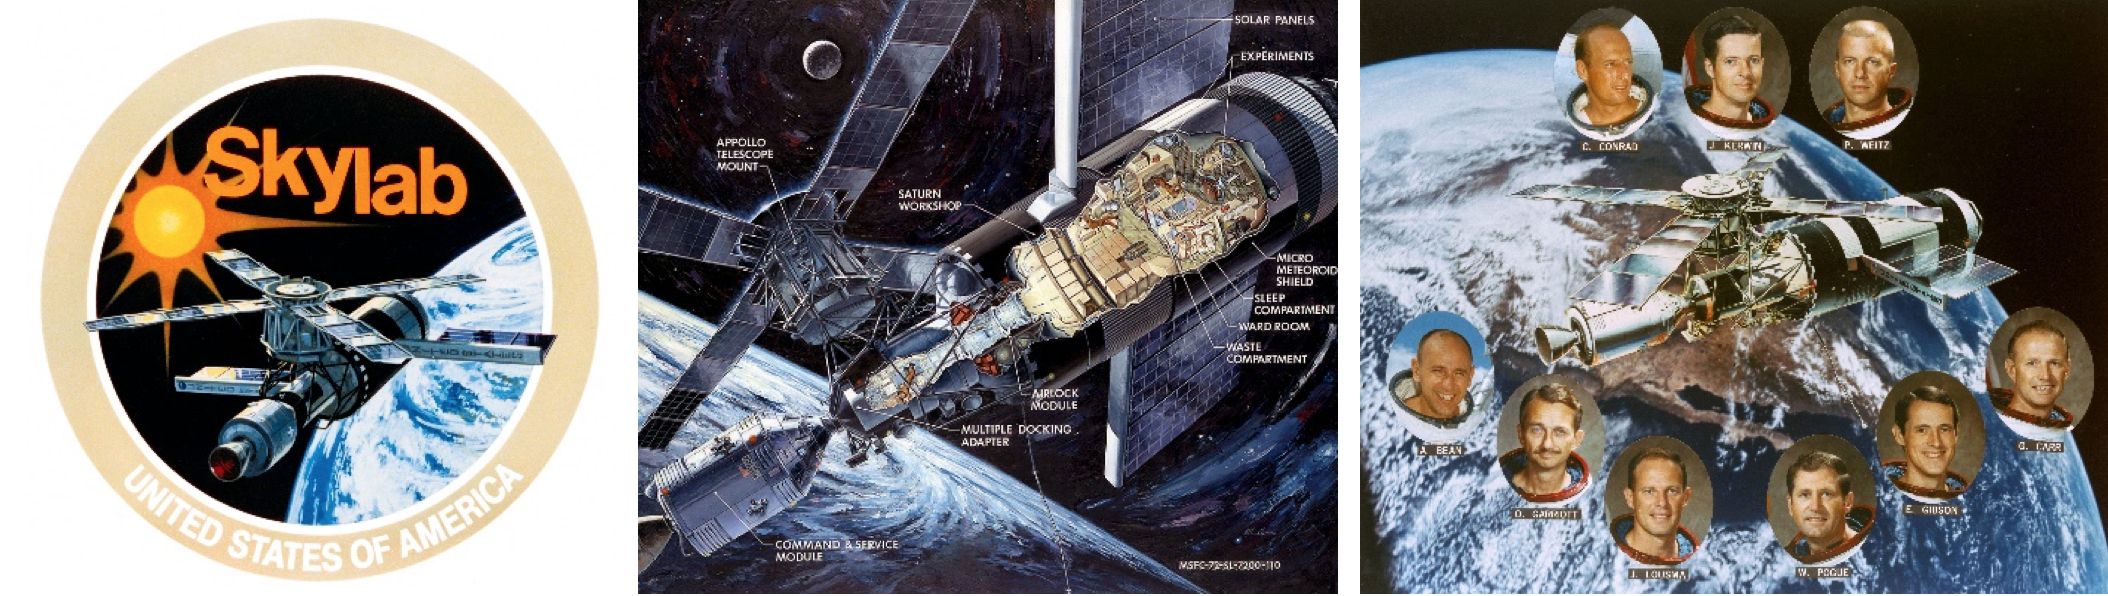 Skylab Space Station PHOTO Astronauts Lab Earth Orbit Final Crew Photo